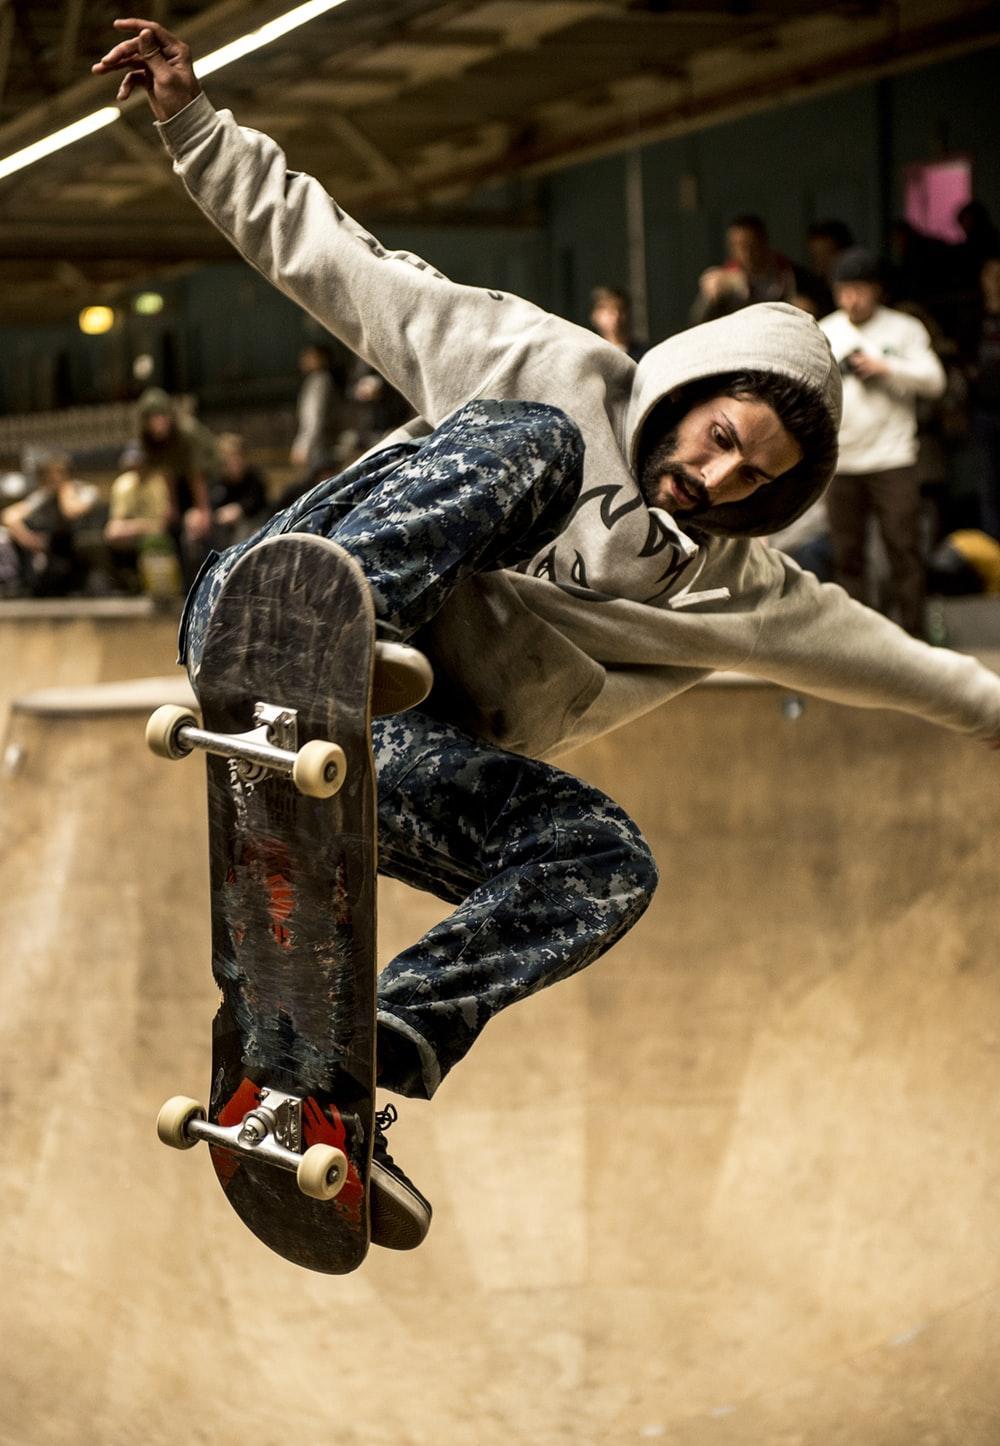 Skater Boy Aesthetic Wallpapers - Wallpaper Cave